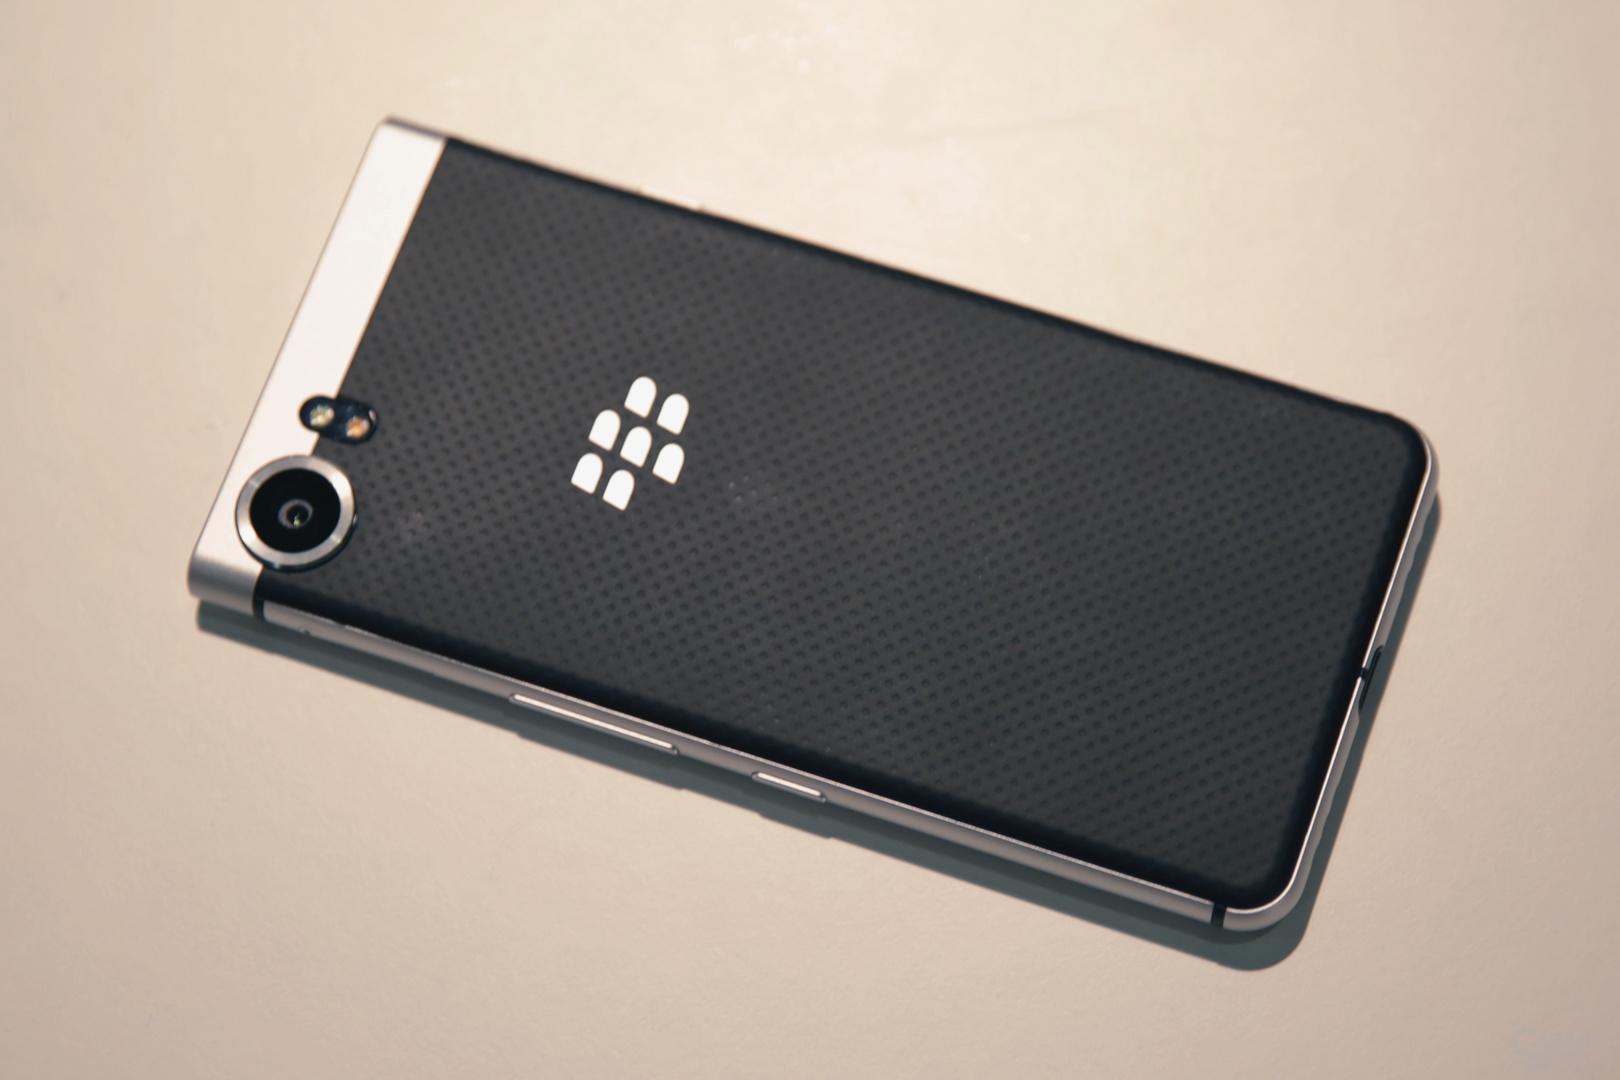 Rückseite des BlackBerry KeyOne